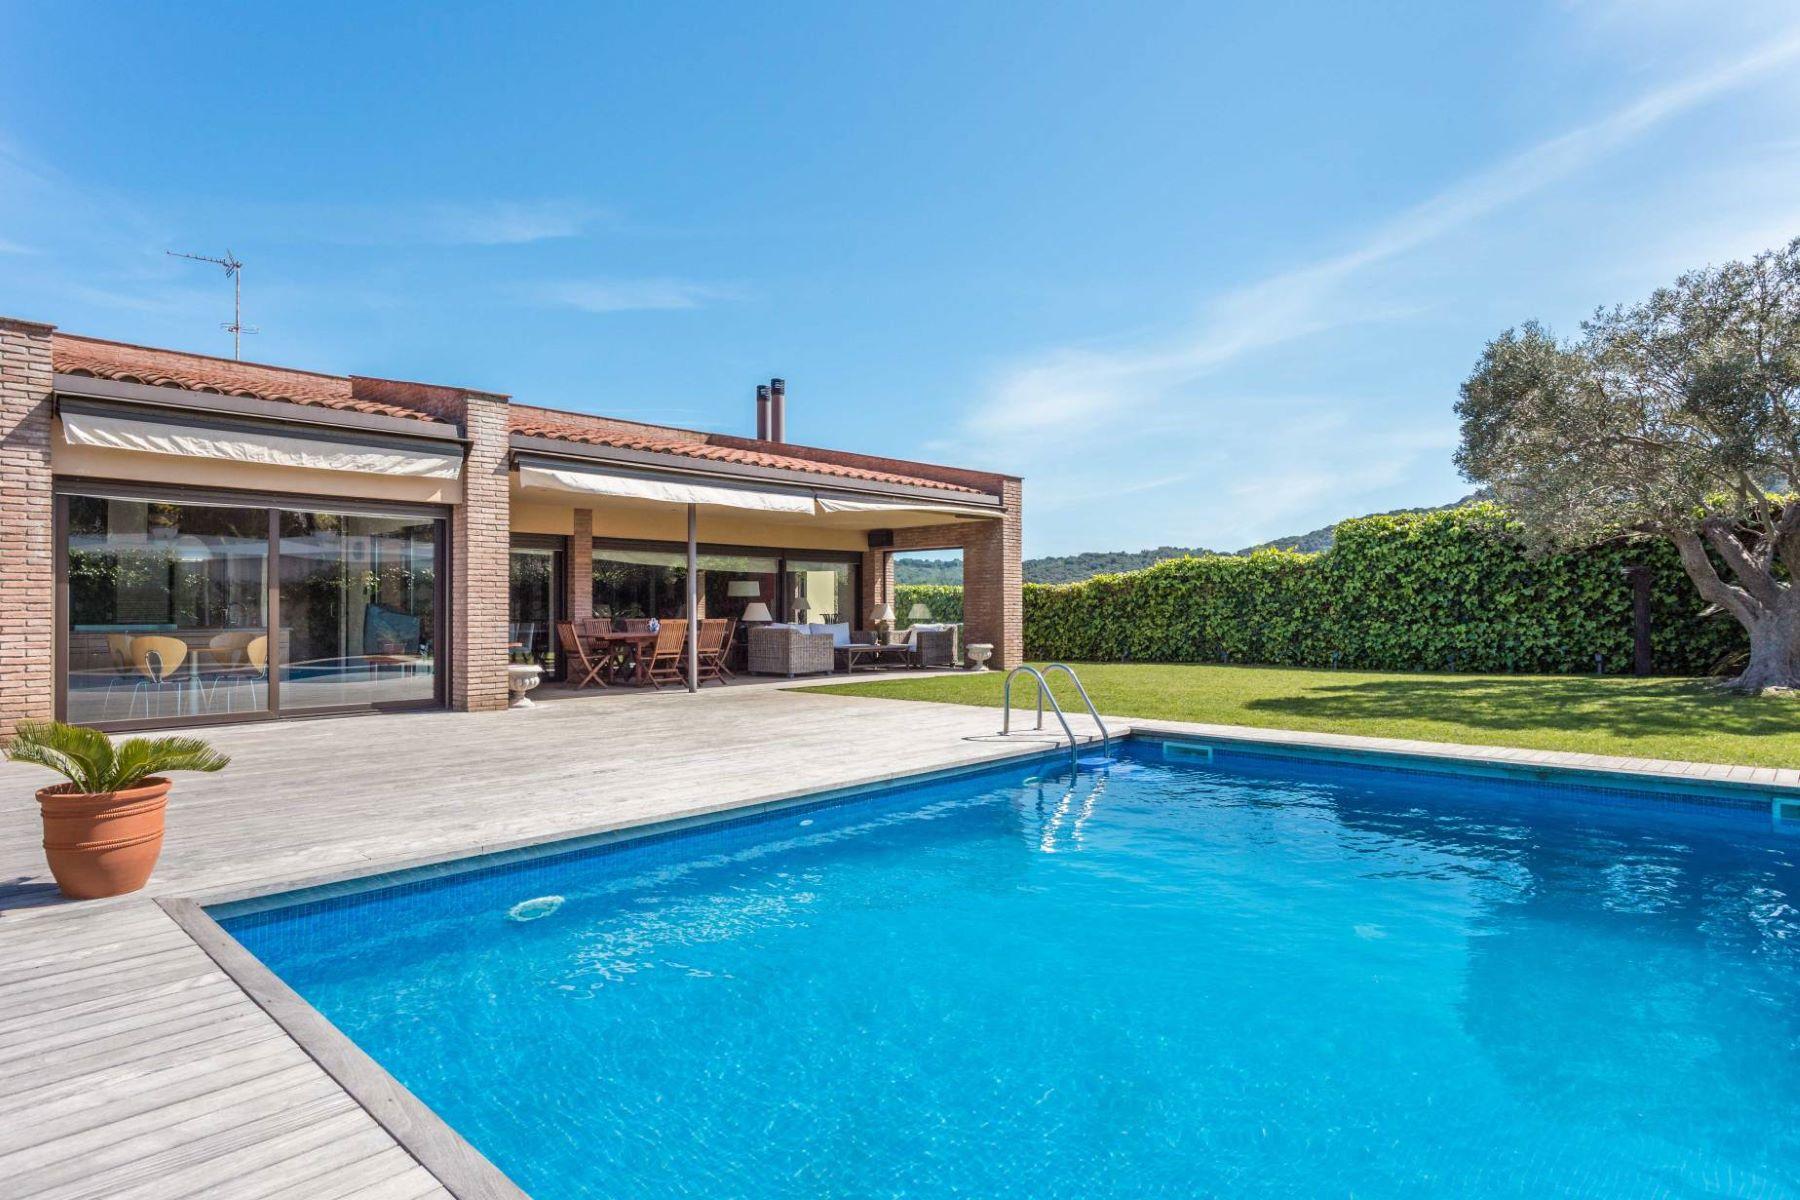 Tek Ailelik Ev için Satış at Elegant property in quiet setting in Sant Feliu de Guíxols Sant Feliu De Guixols, Costa Brava, 17220 Ispanya